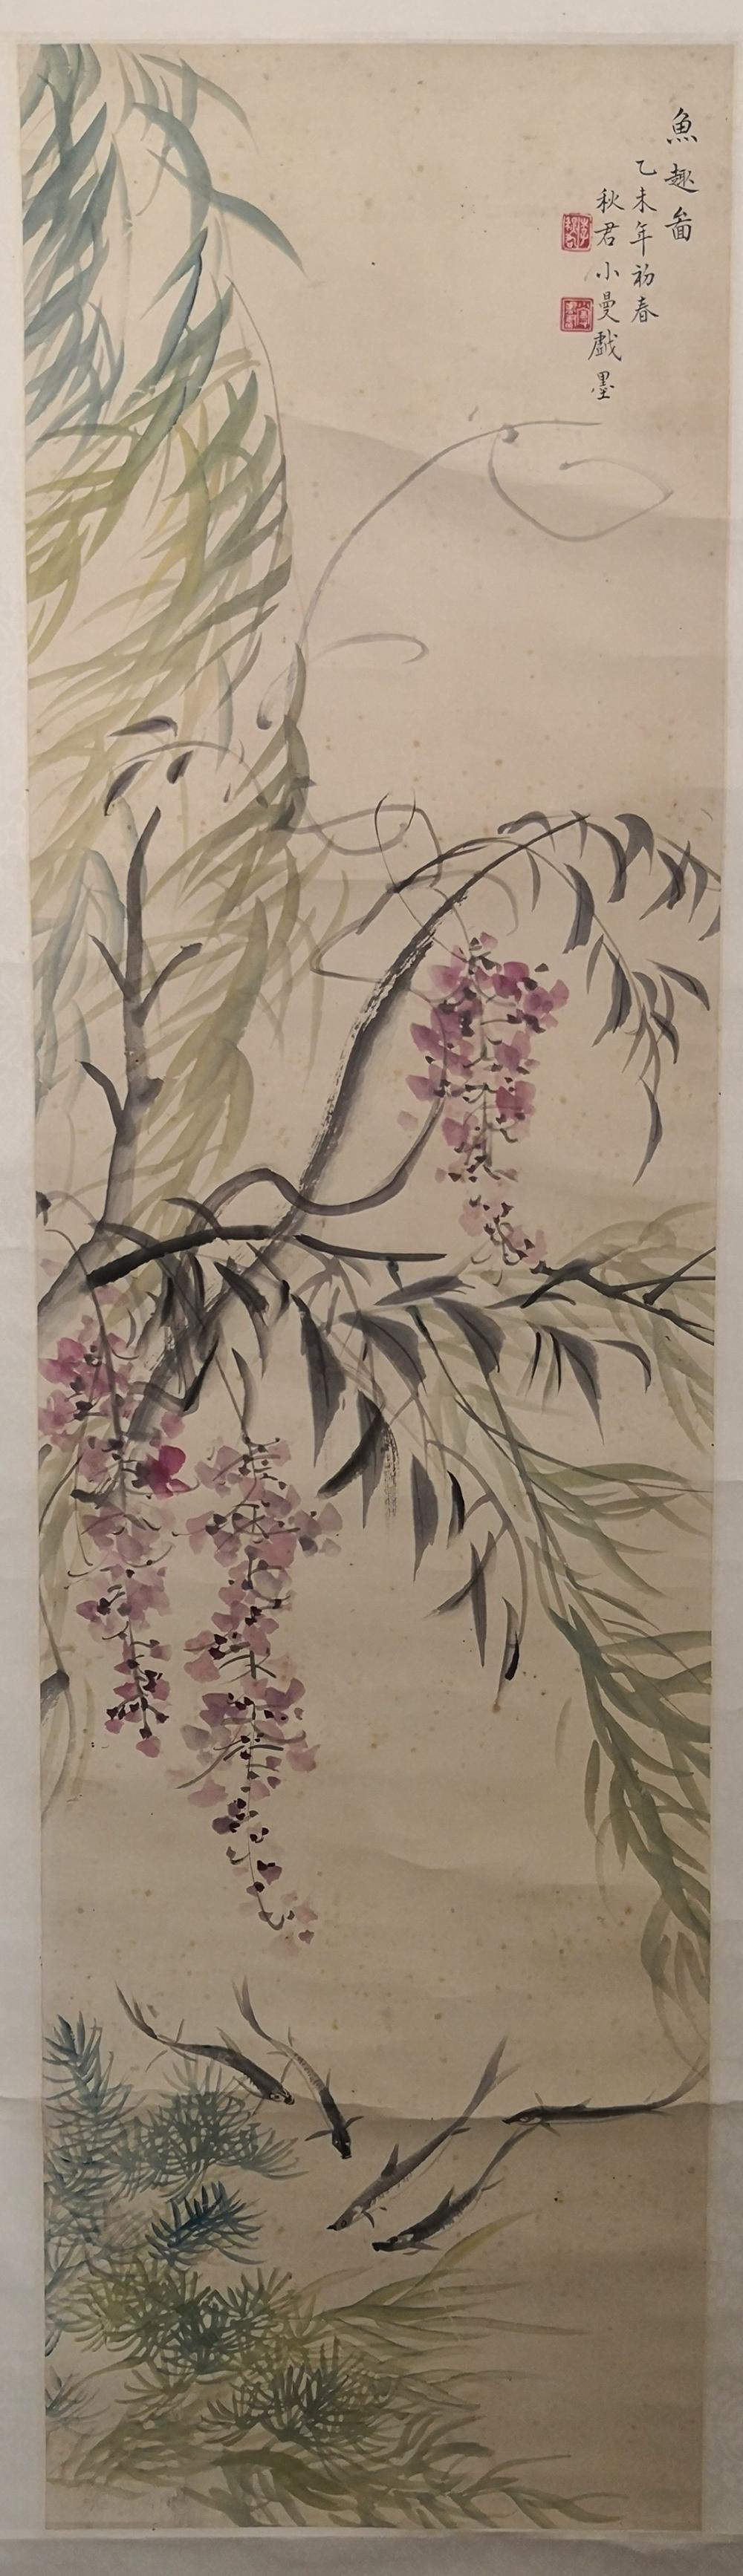 A CHINESE PAINTING BY LI QIUJUN; LU XIAOMAN